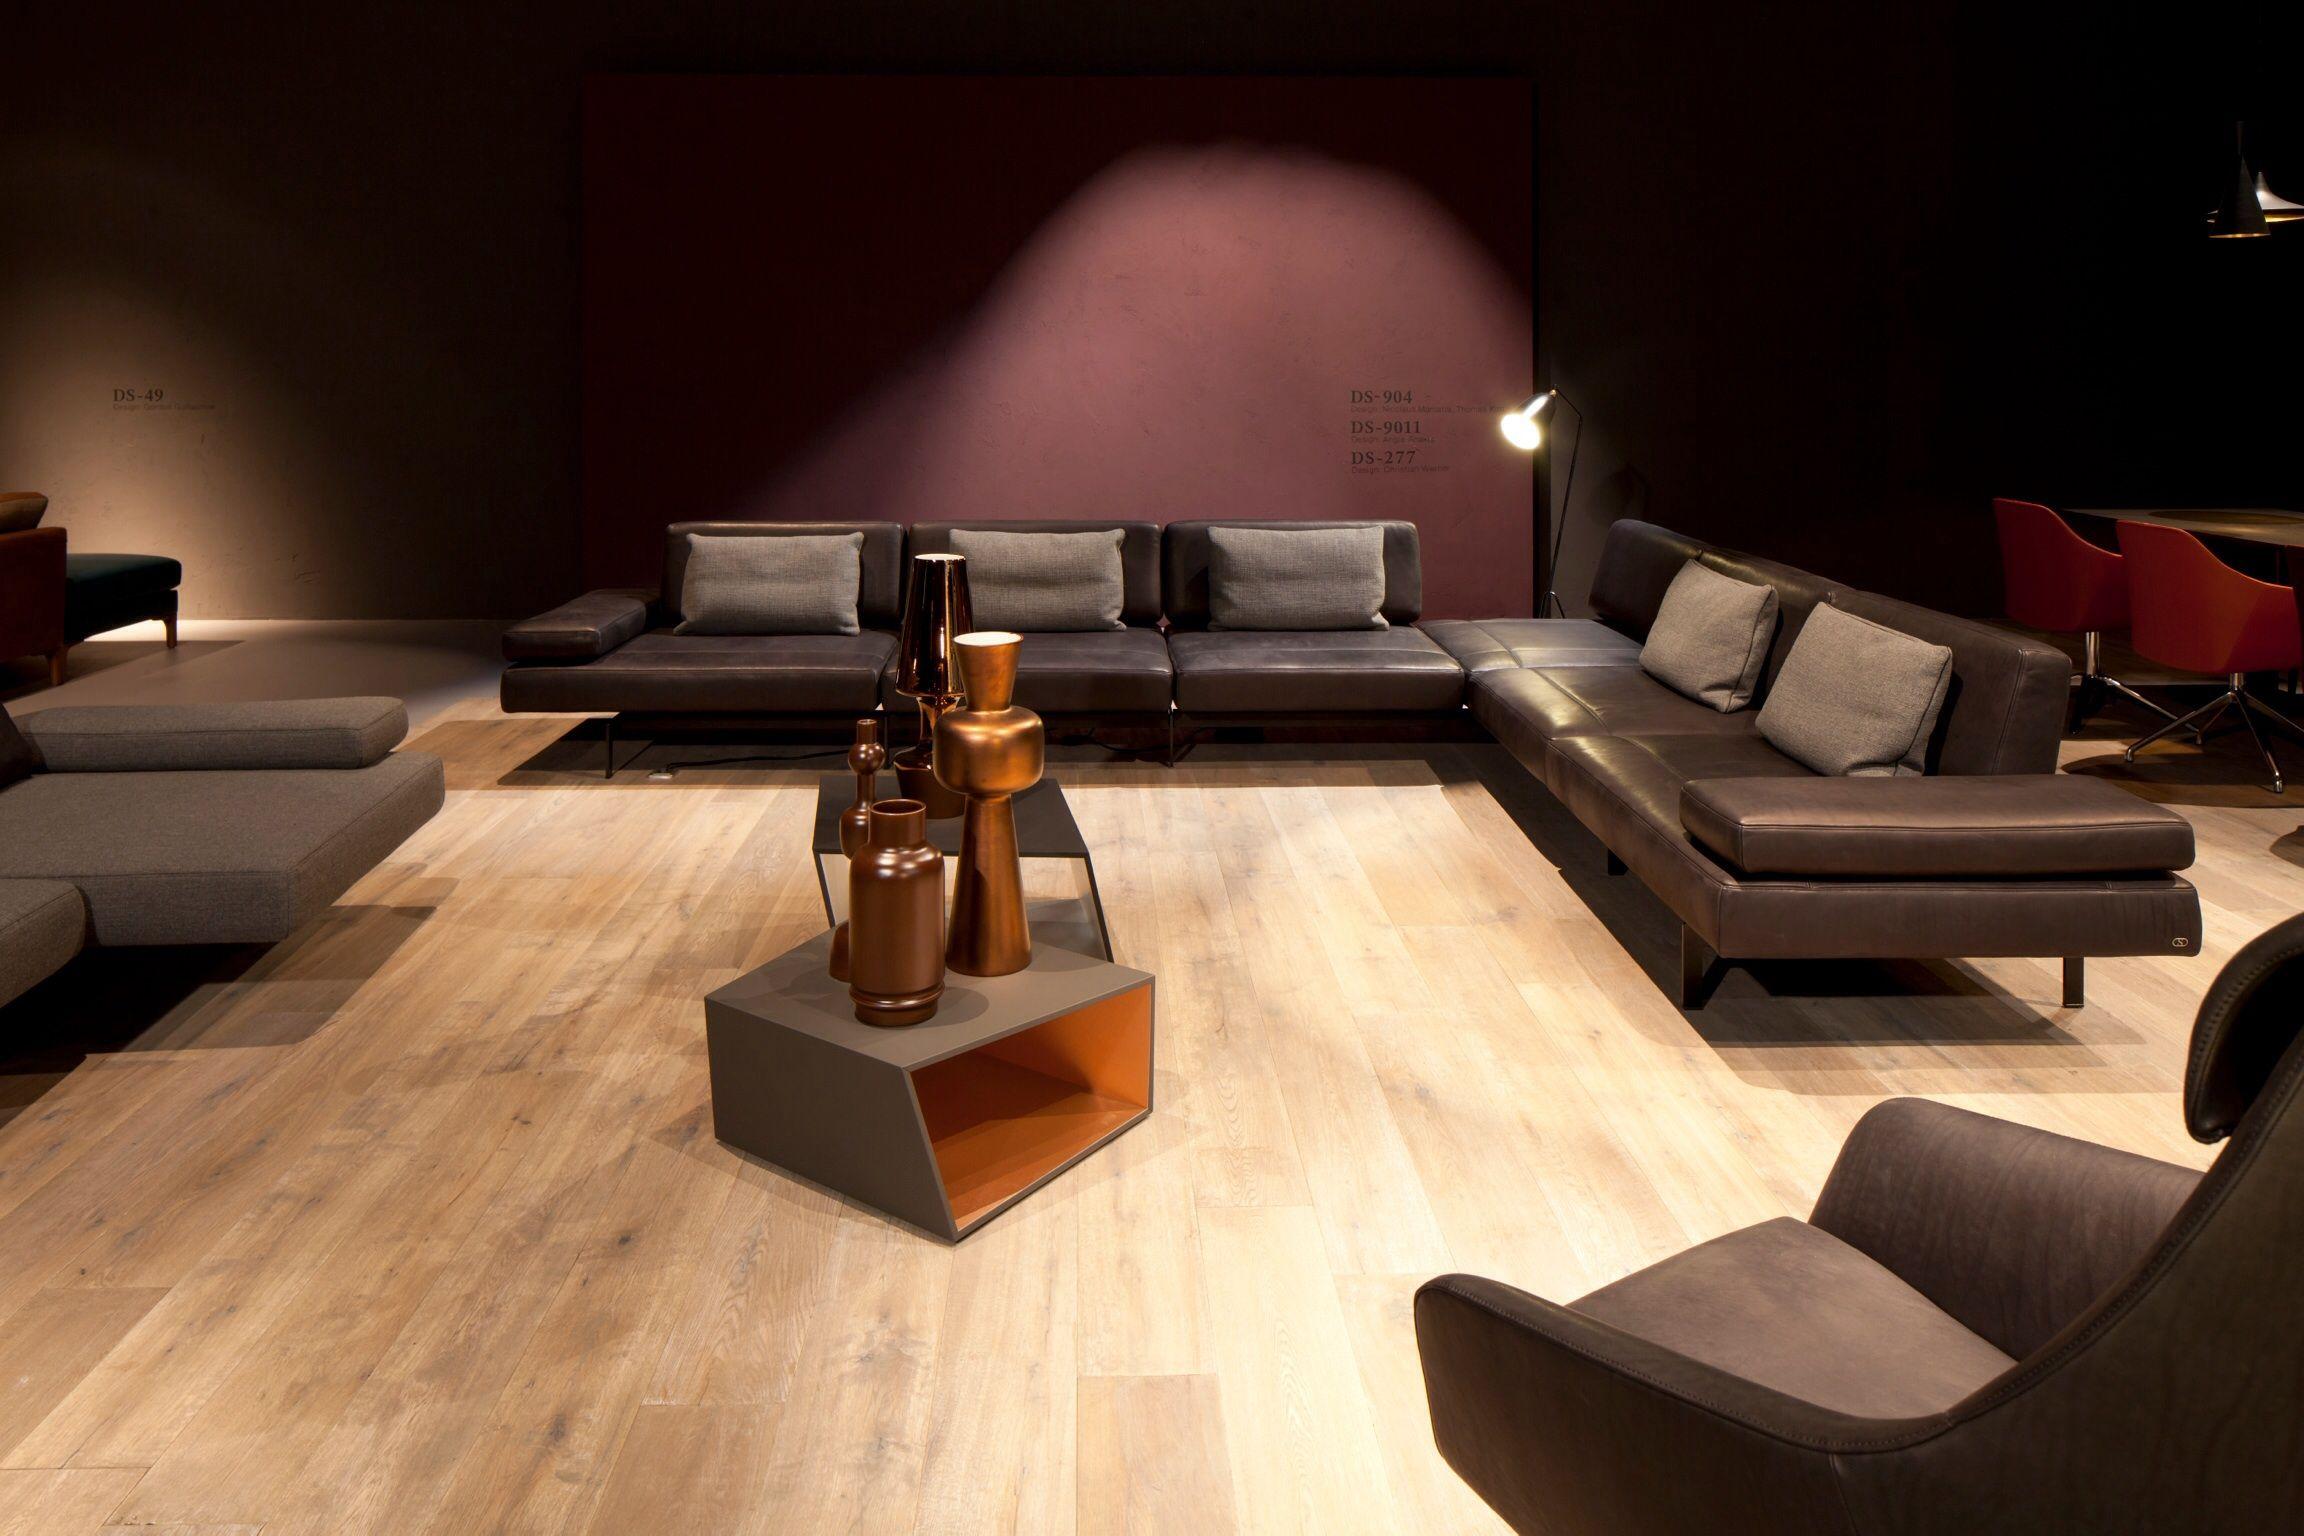 De sede ds 904 design nicolaus maniatis thomas kim de sede pinterest design - De sede showroom ...